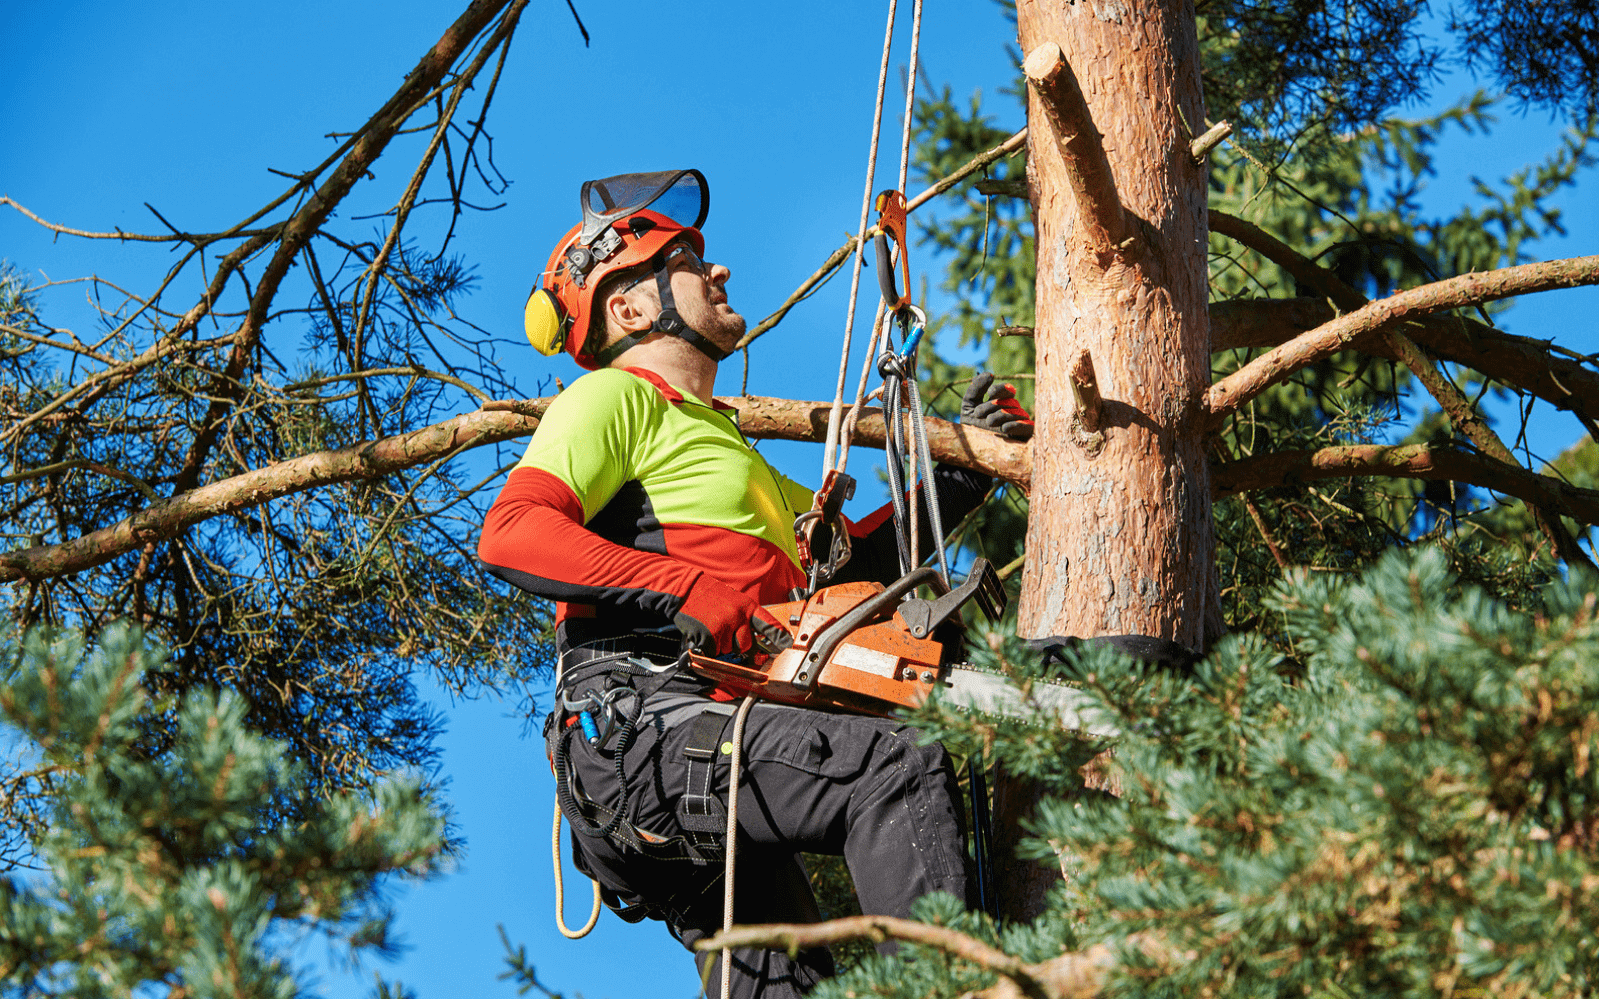 Tree surgeon working up high